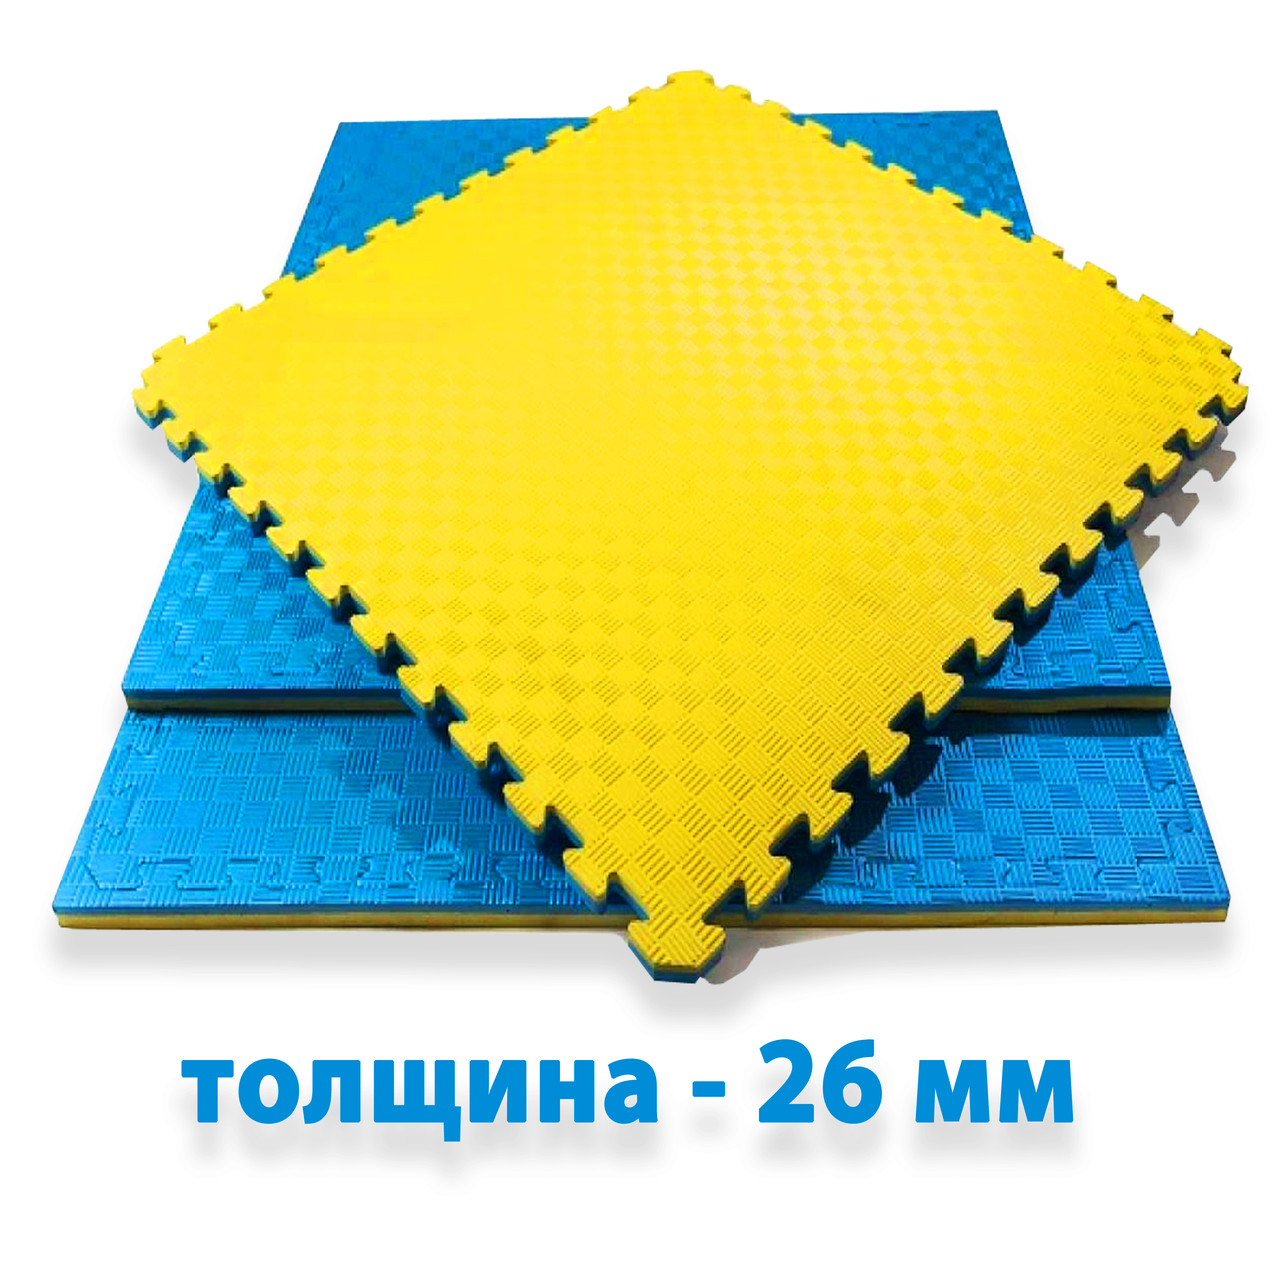 Спортивный мат (ТАТАМИ) 26 мм EVA (Турция), желто-синий